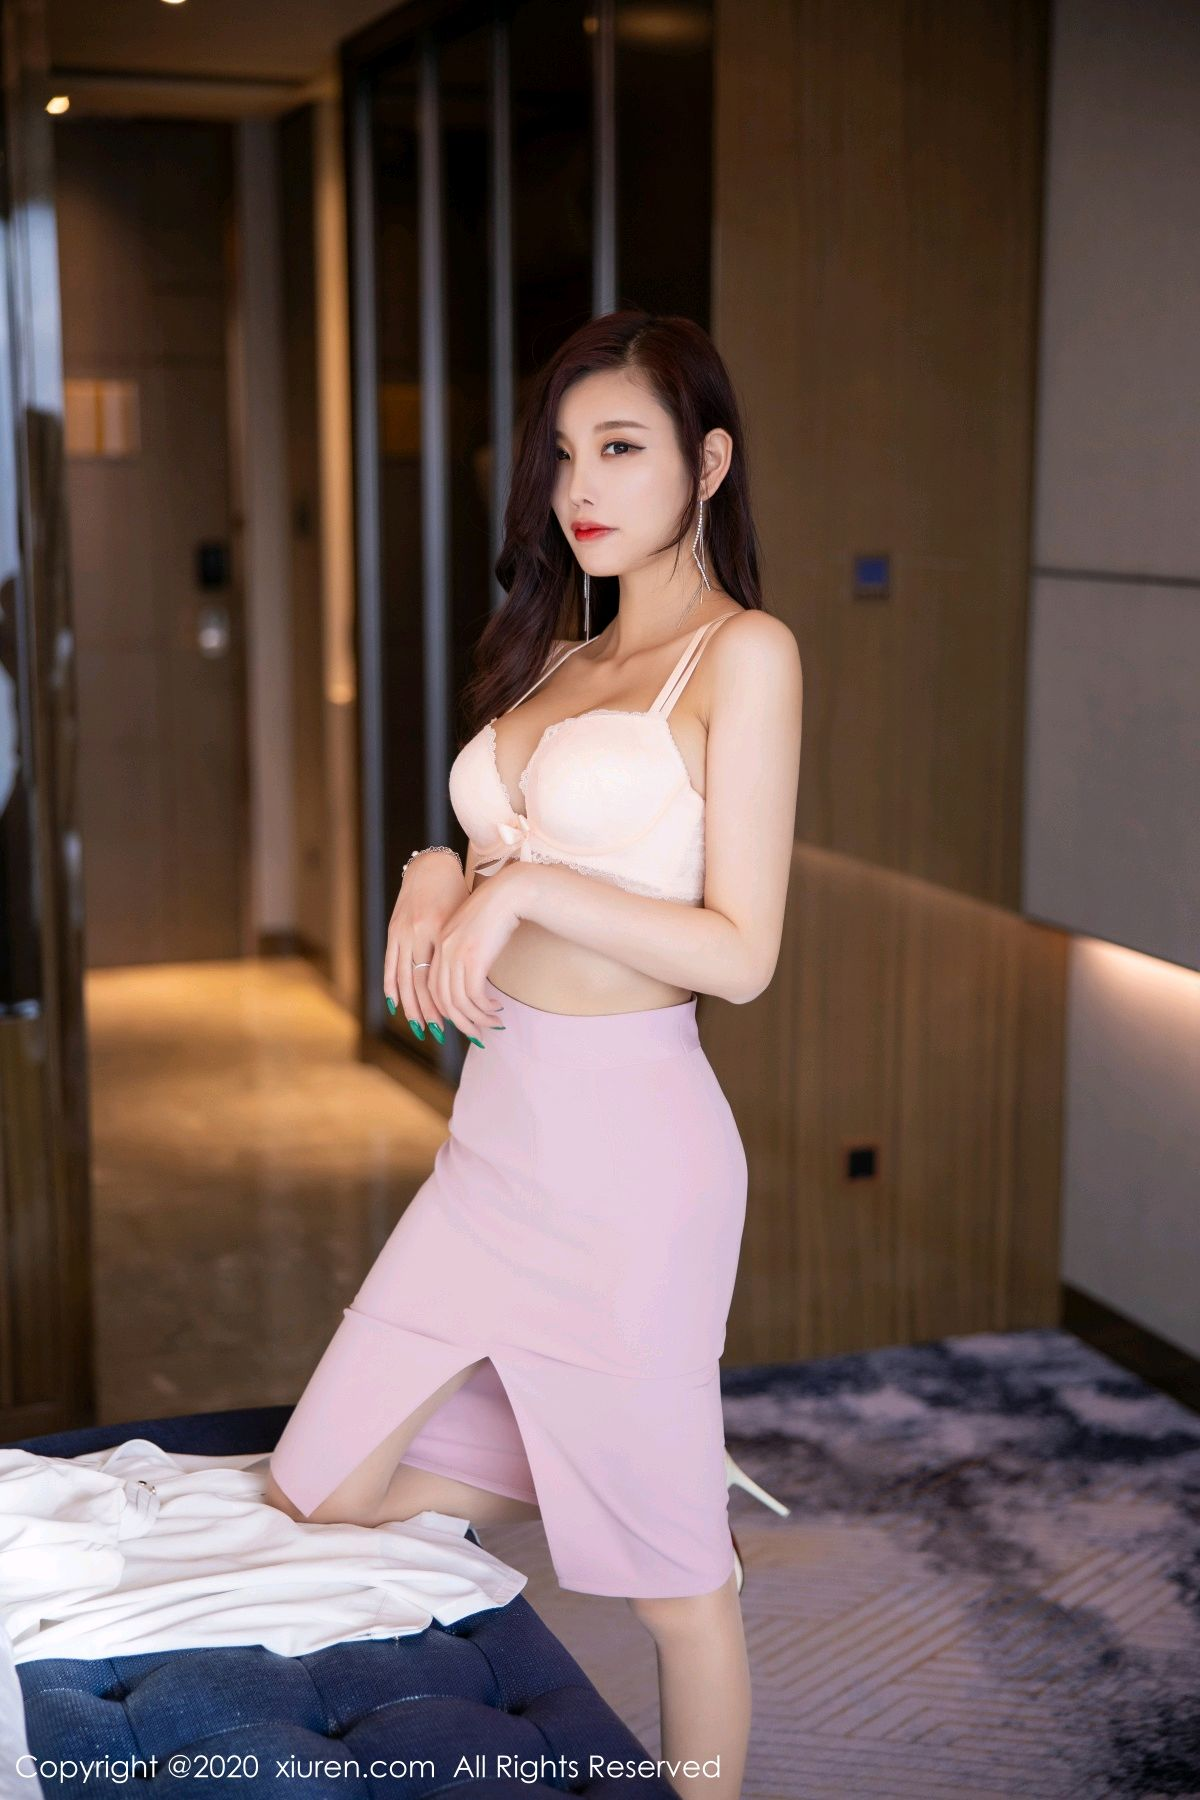 [XiuRen] Vol.2431 Yang Chen Chen 56P, Tall, Underwear, Uniform, Xiuren, Yang Chen Chen